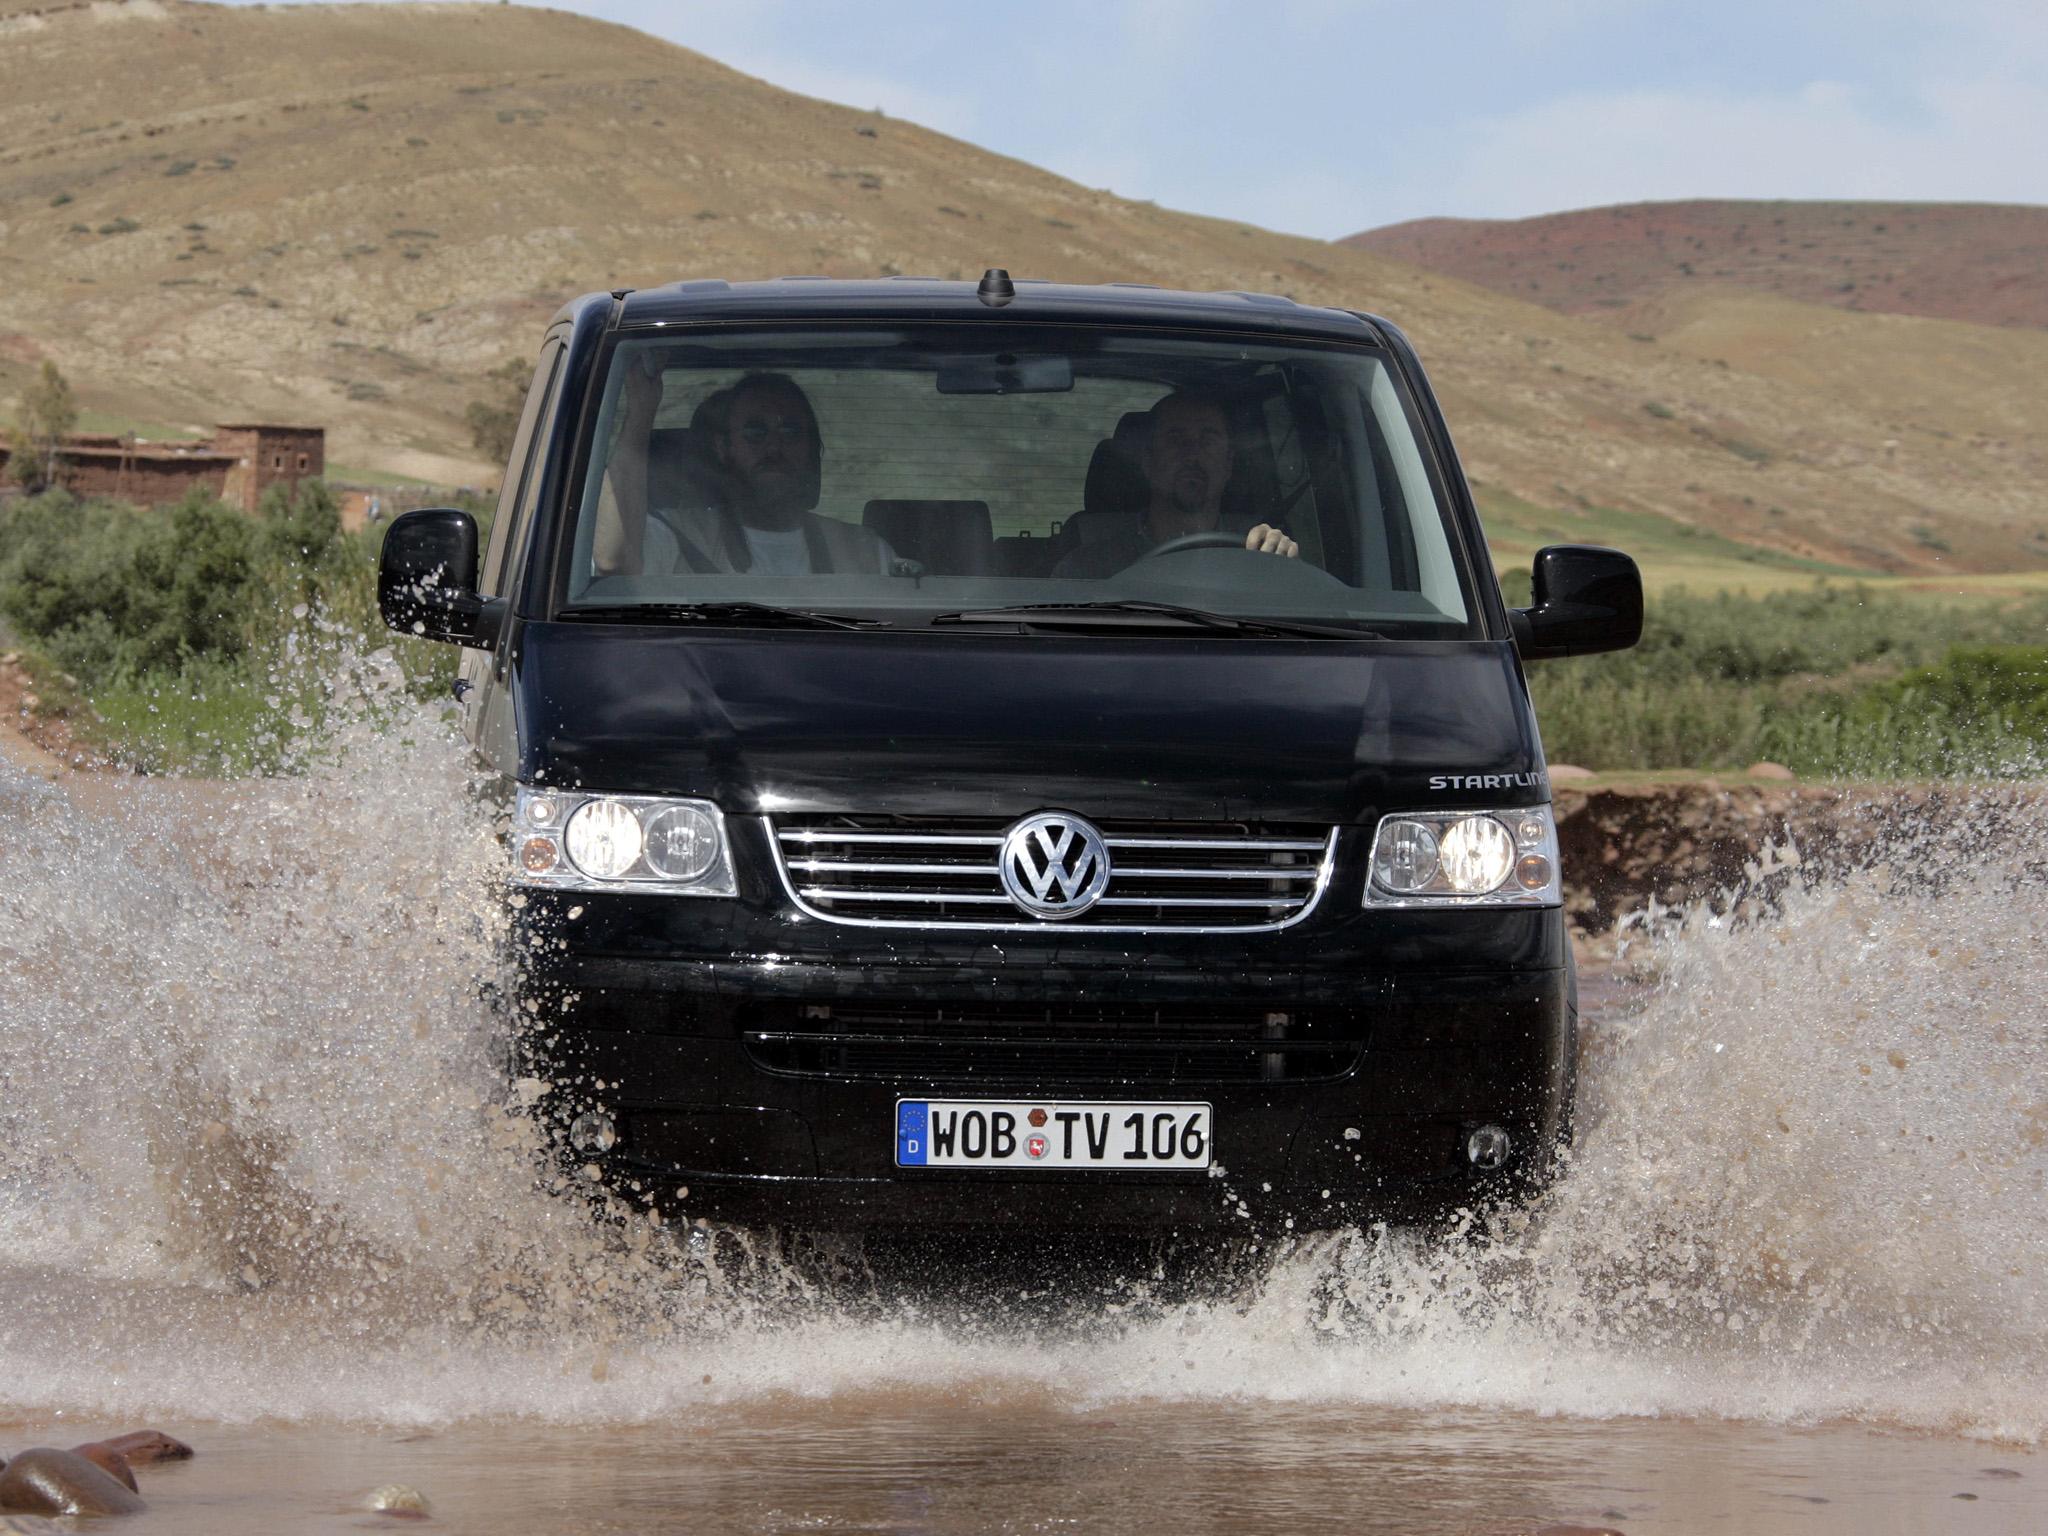 Минивэн Volkswagen T5 Multivan Startline. 2006 - 2009 годы